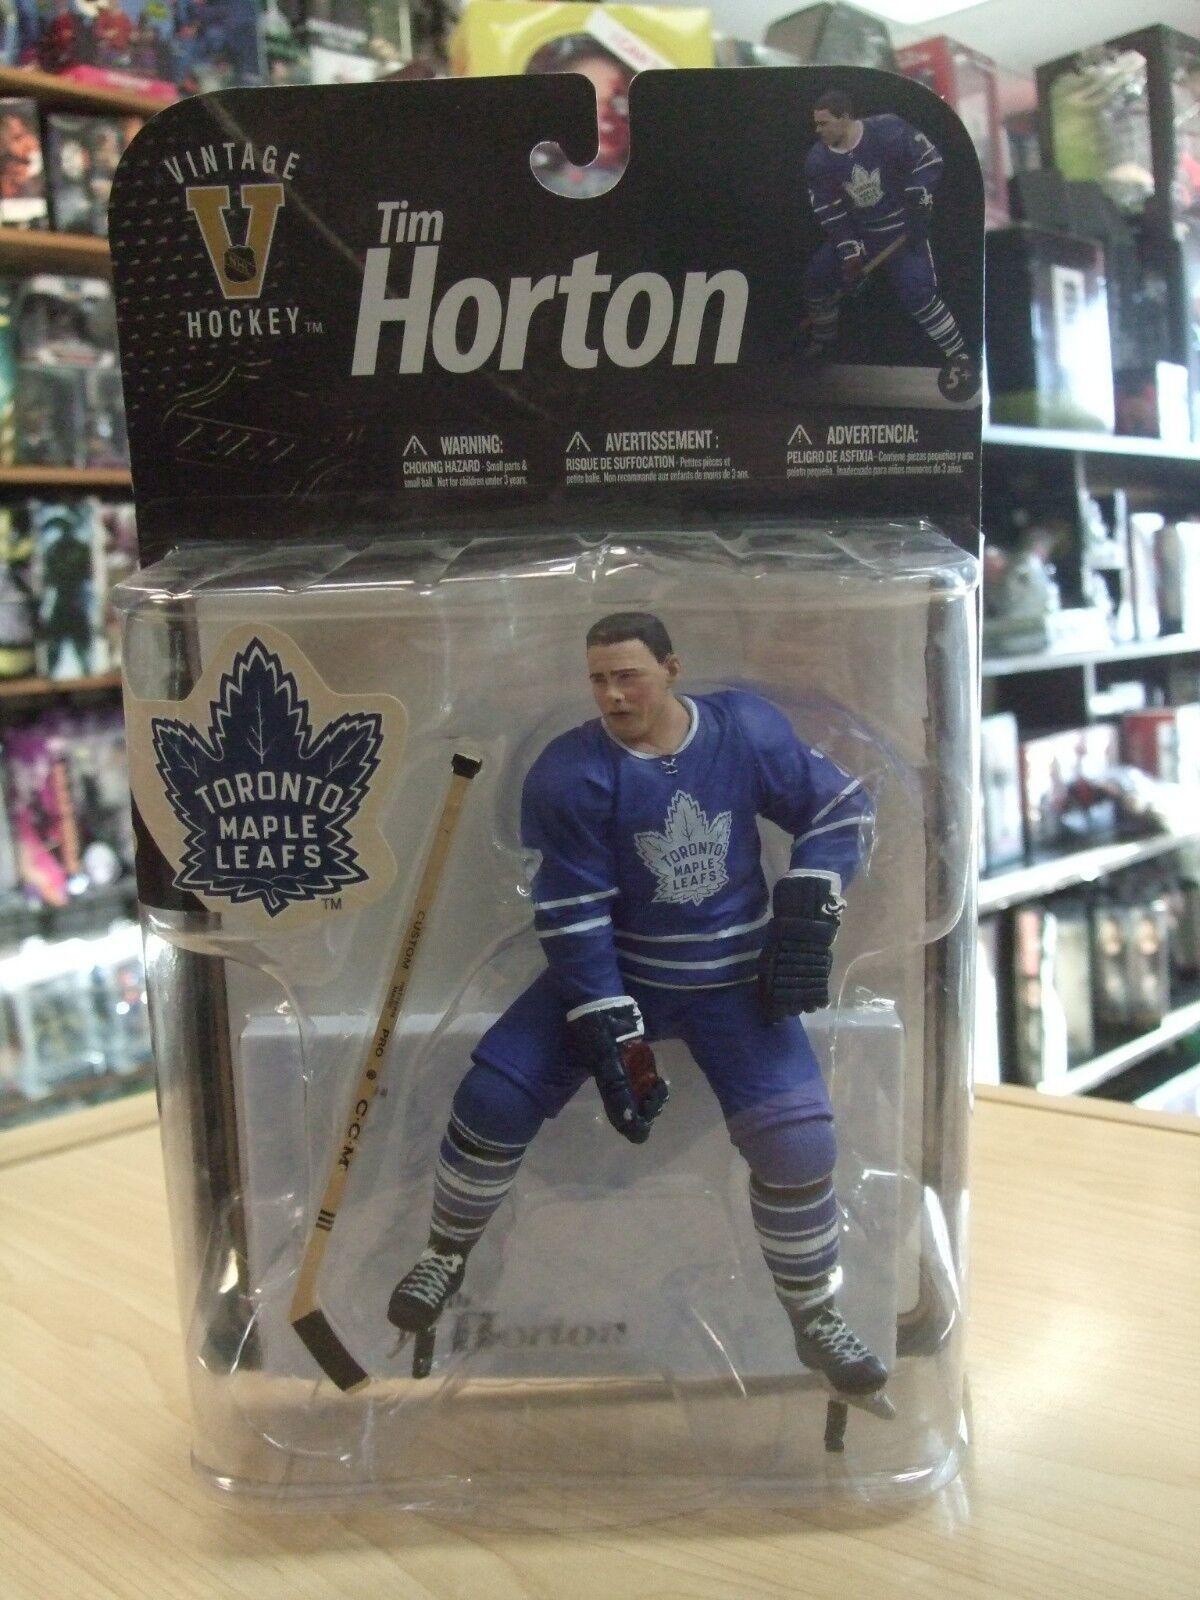 Tim Horton Tgoldnto Maple Leafs NHL Legends Series 8 by McFarlane